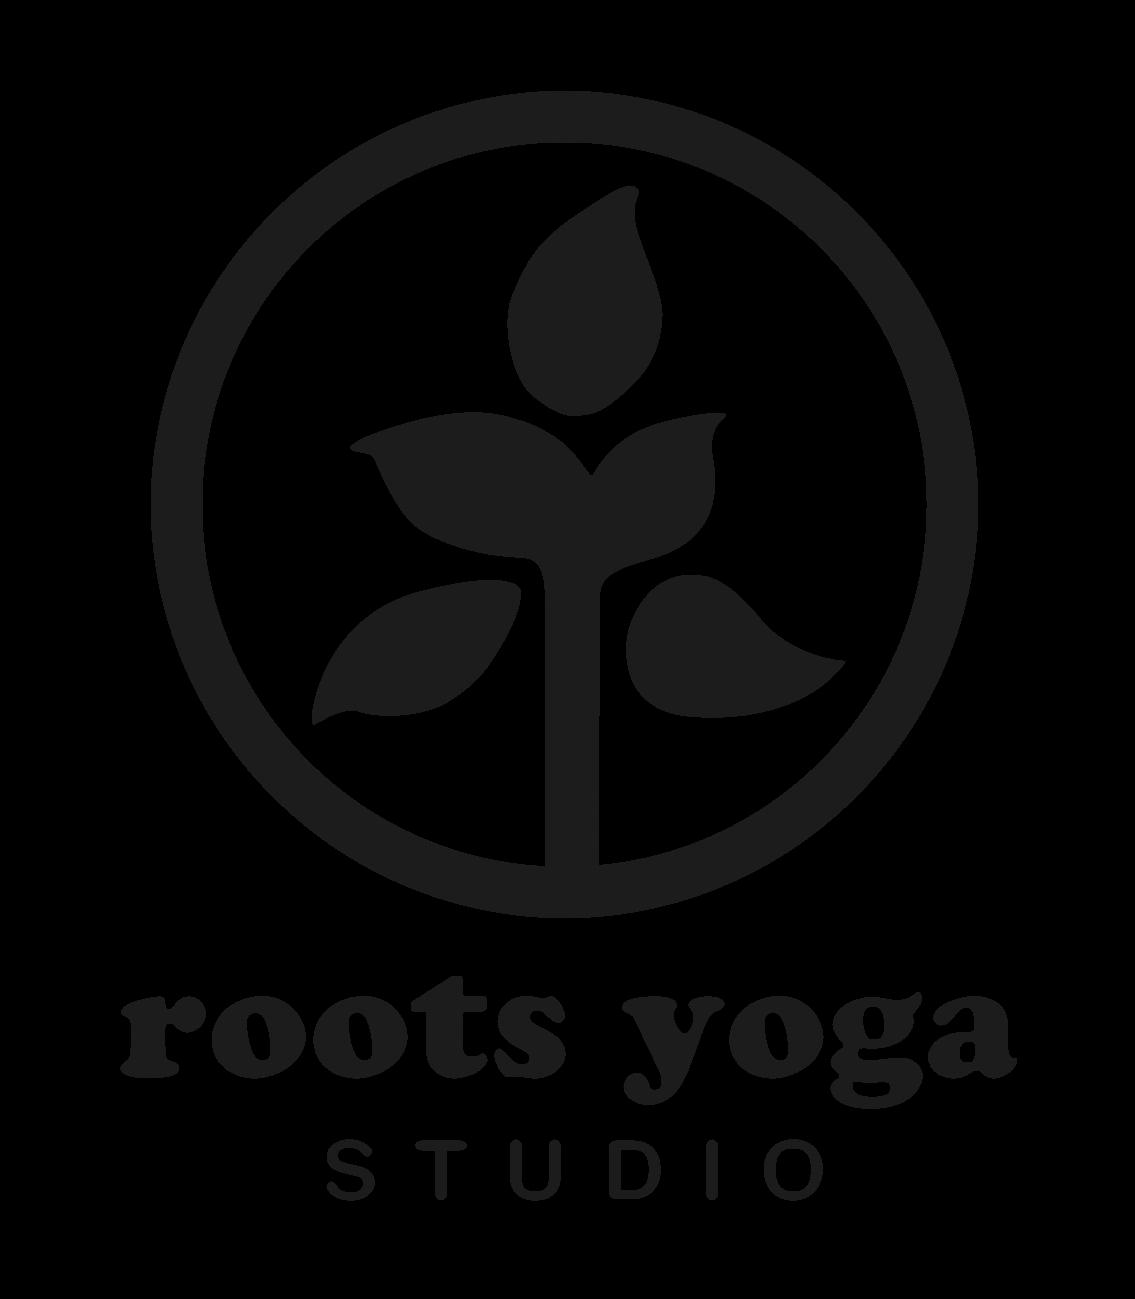 rootsyoga_LOGOgrey.png